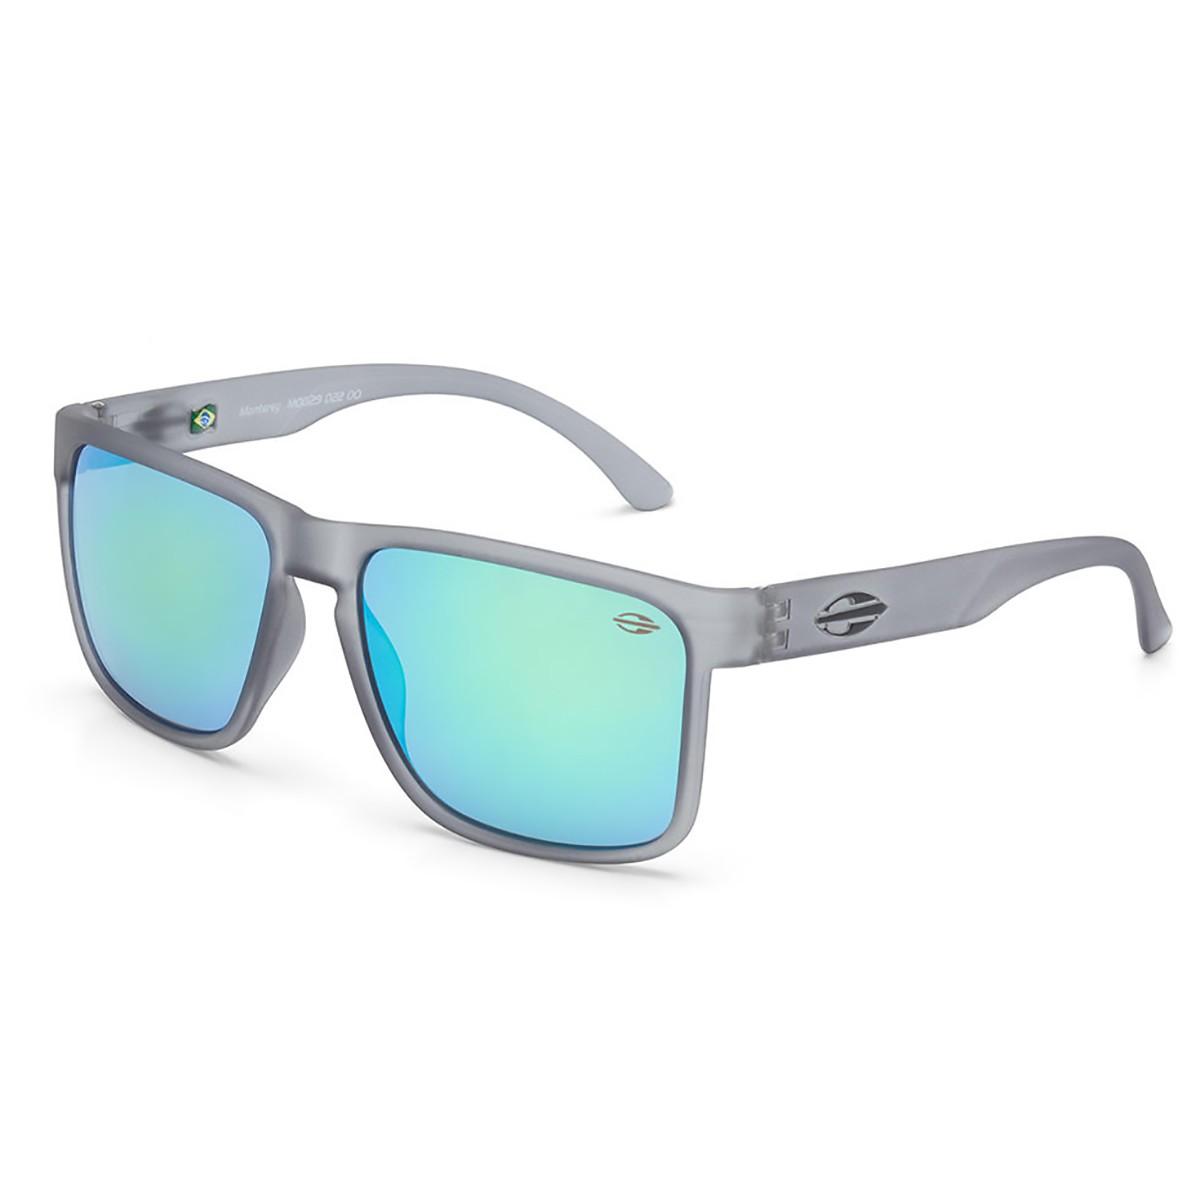 e045020390ddb Compre Óculos de Sol Mormaii Monterey em 10X   Tri-Jóia Shop